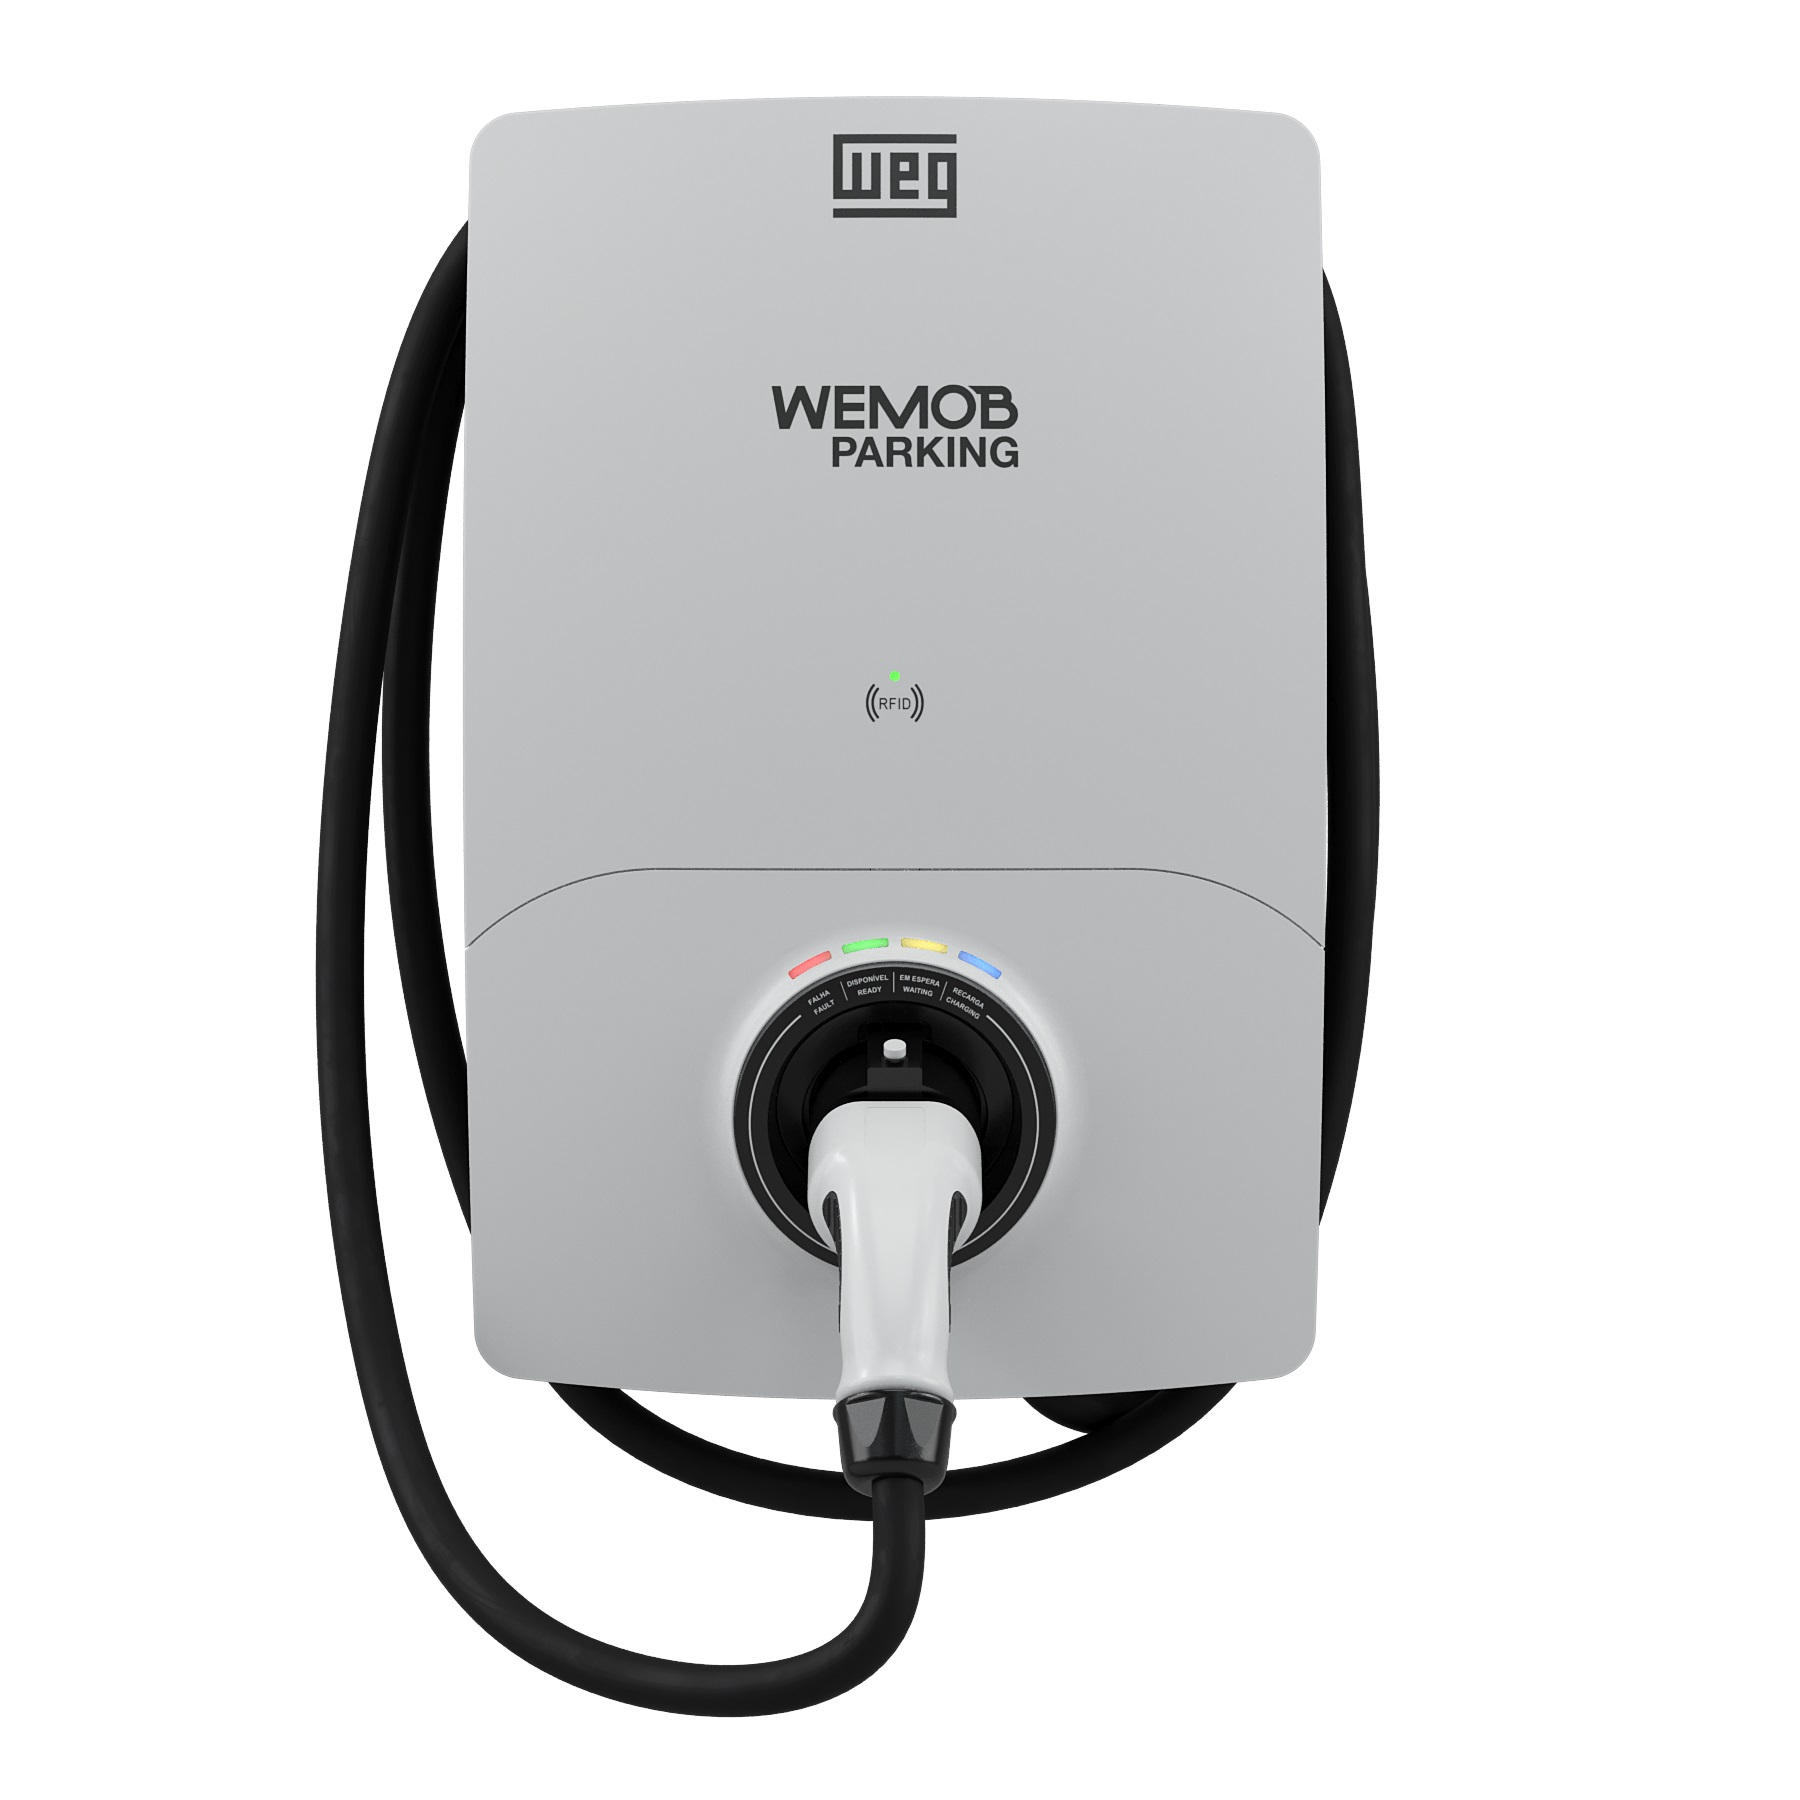 ESTAÇÃO DE RECARGA WEG - WEMOB PARKING G2 - 22kW - S/IHM C/ 1 CABO